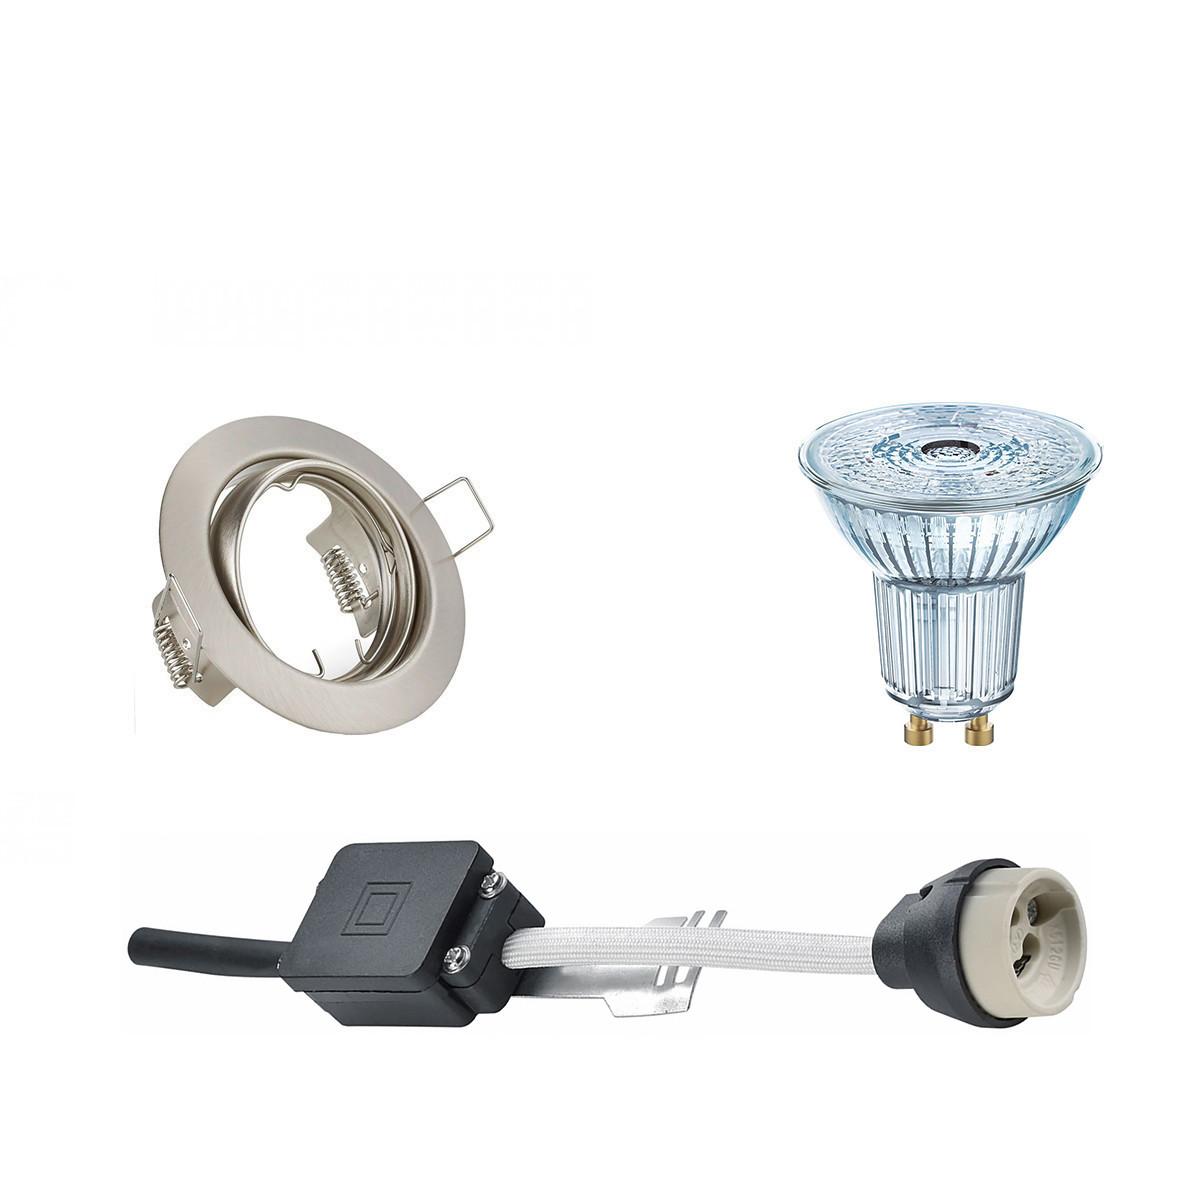 OSRAM - LED Spot Set - Parathom PAR16 930 36D - GU10 Fitting - Dimbaar - Inbouw Rond - Mat Nikkel -